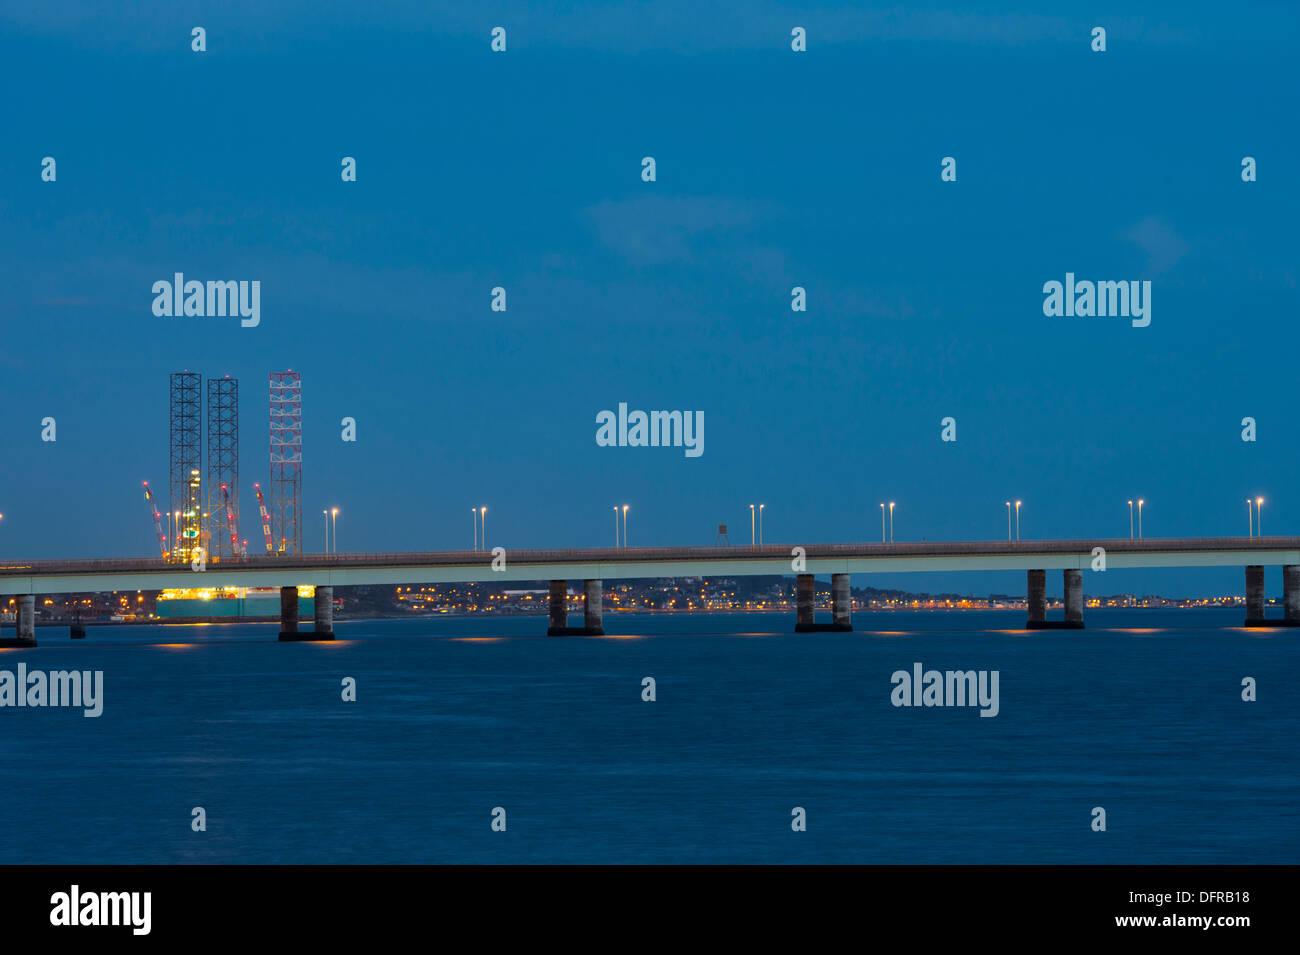 Road bridge crossing the Firth of Tay, Scotland. - Stock Image